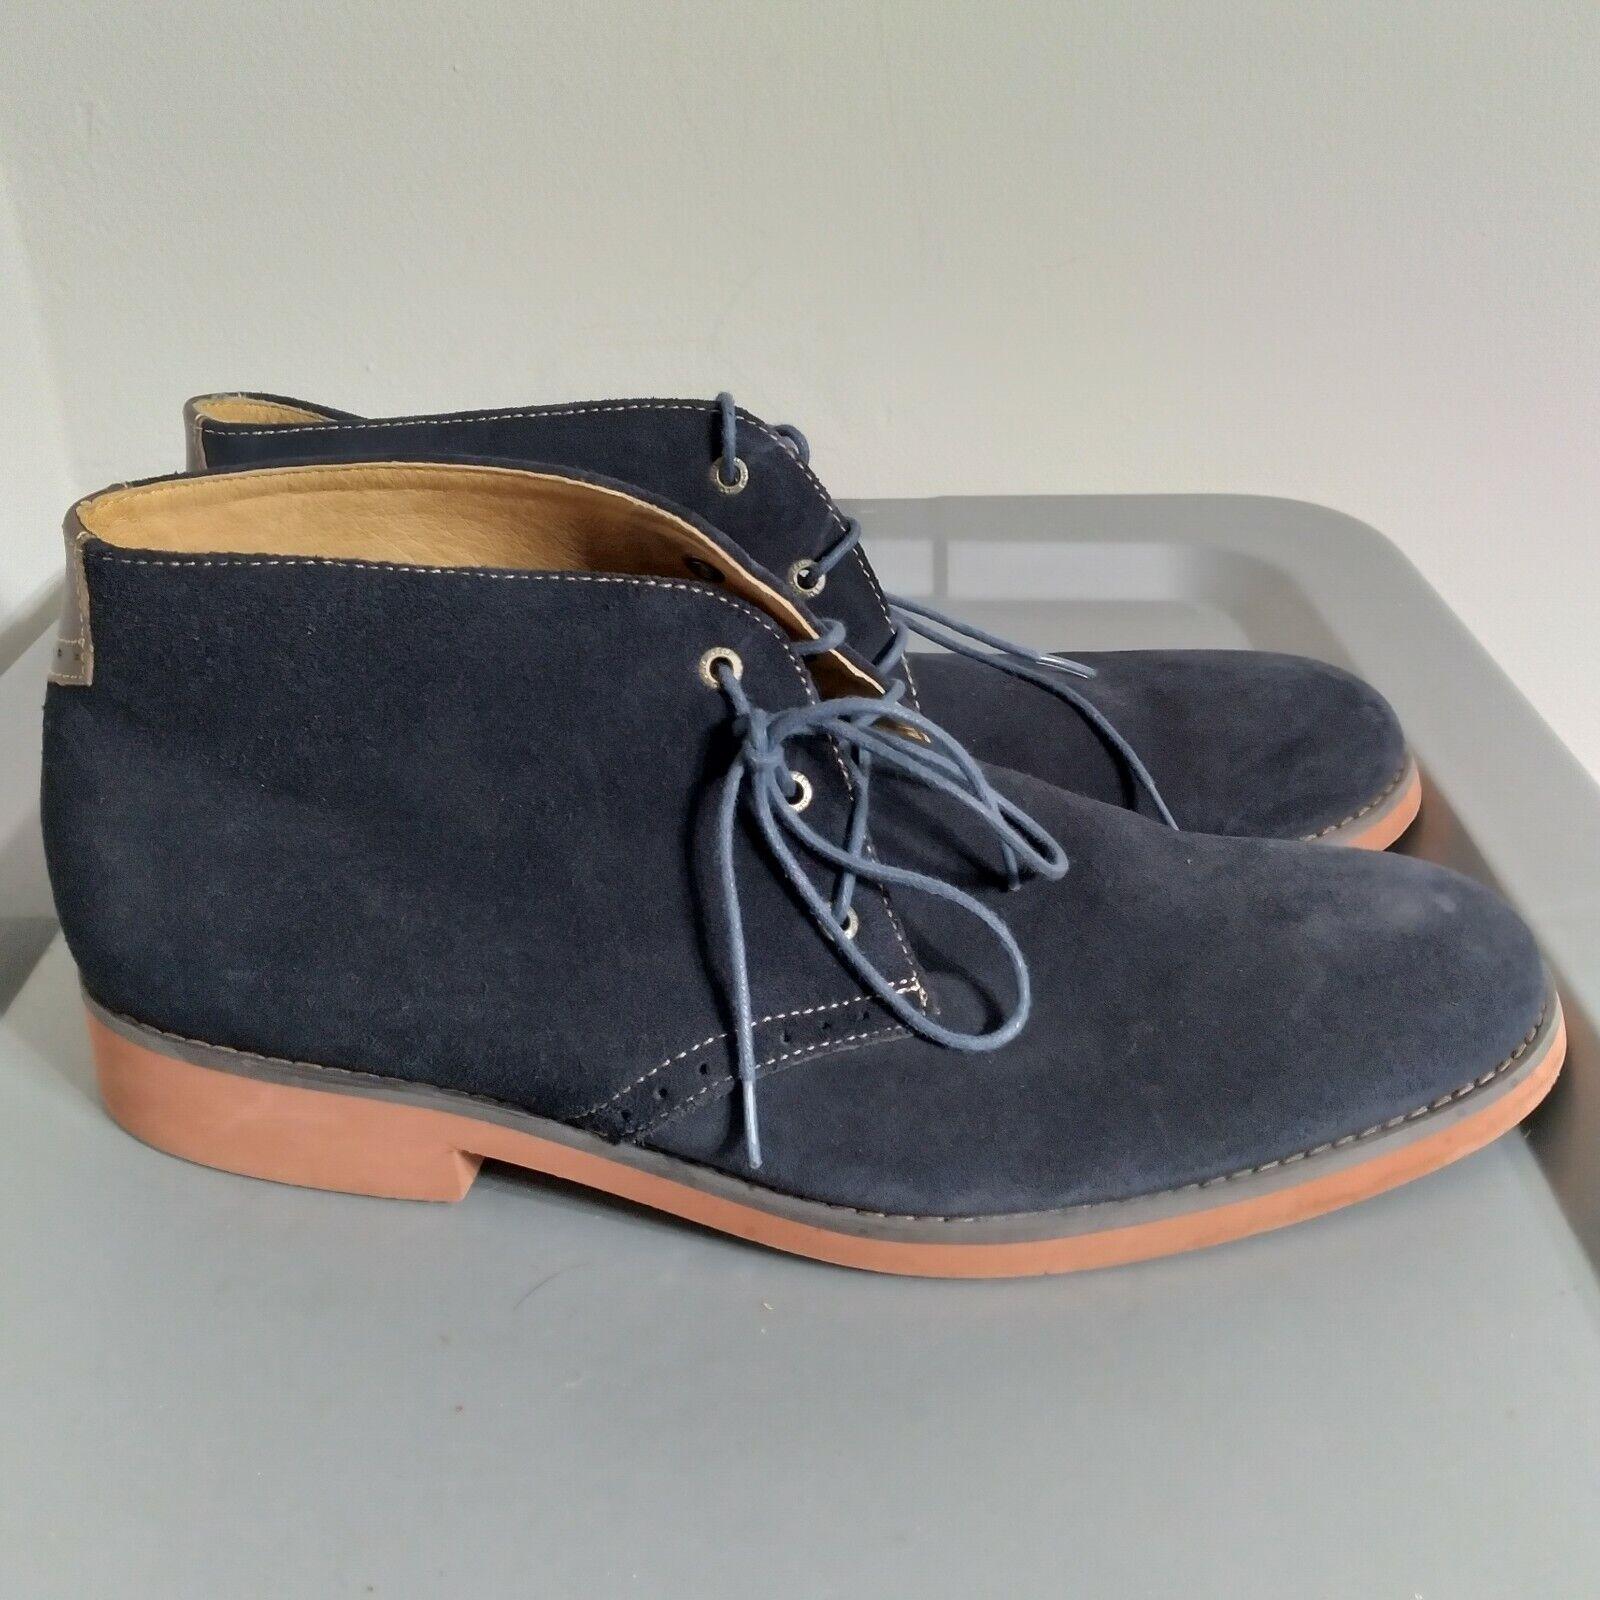 Johnston & Murphy Men's Size 11M Dress Shoes Blue Suede Lace Up Chukka Oxfords